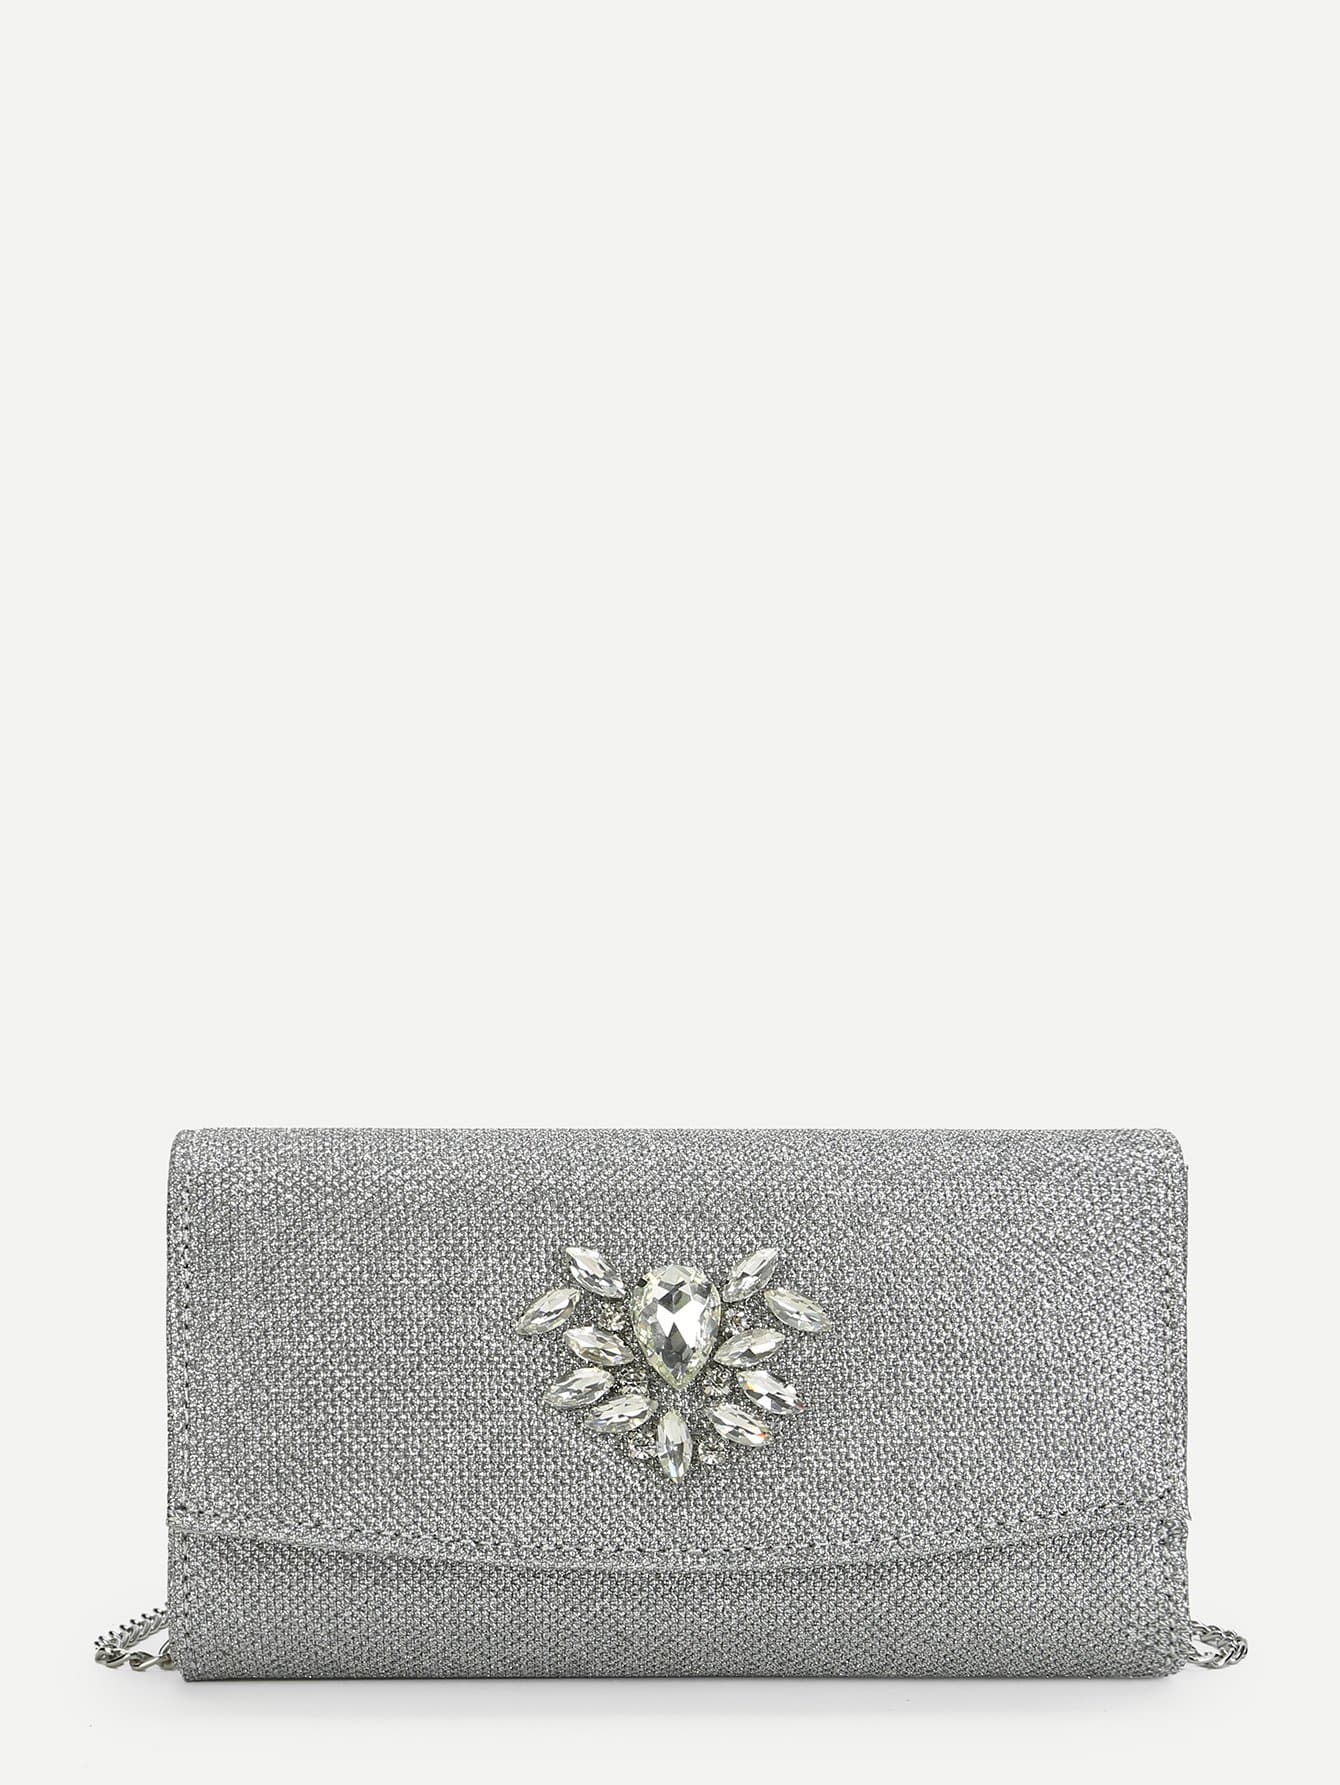 Rhinestone Decorated Flap Clutch Bag rhinestone decorated shoulder bag